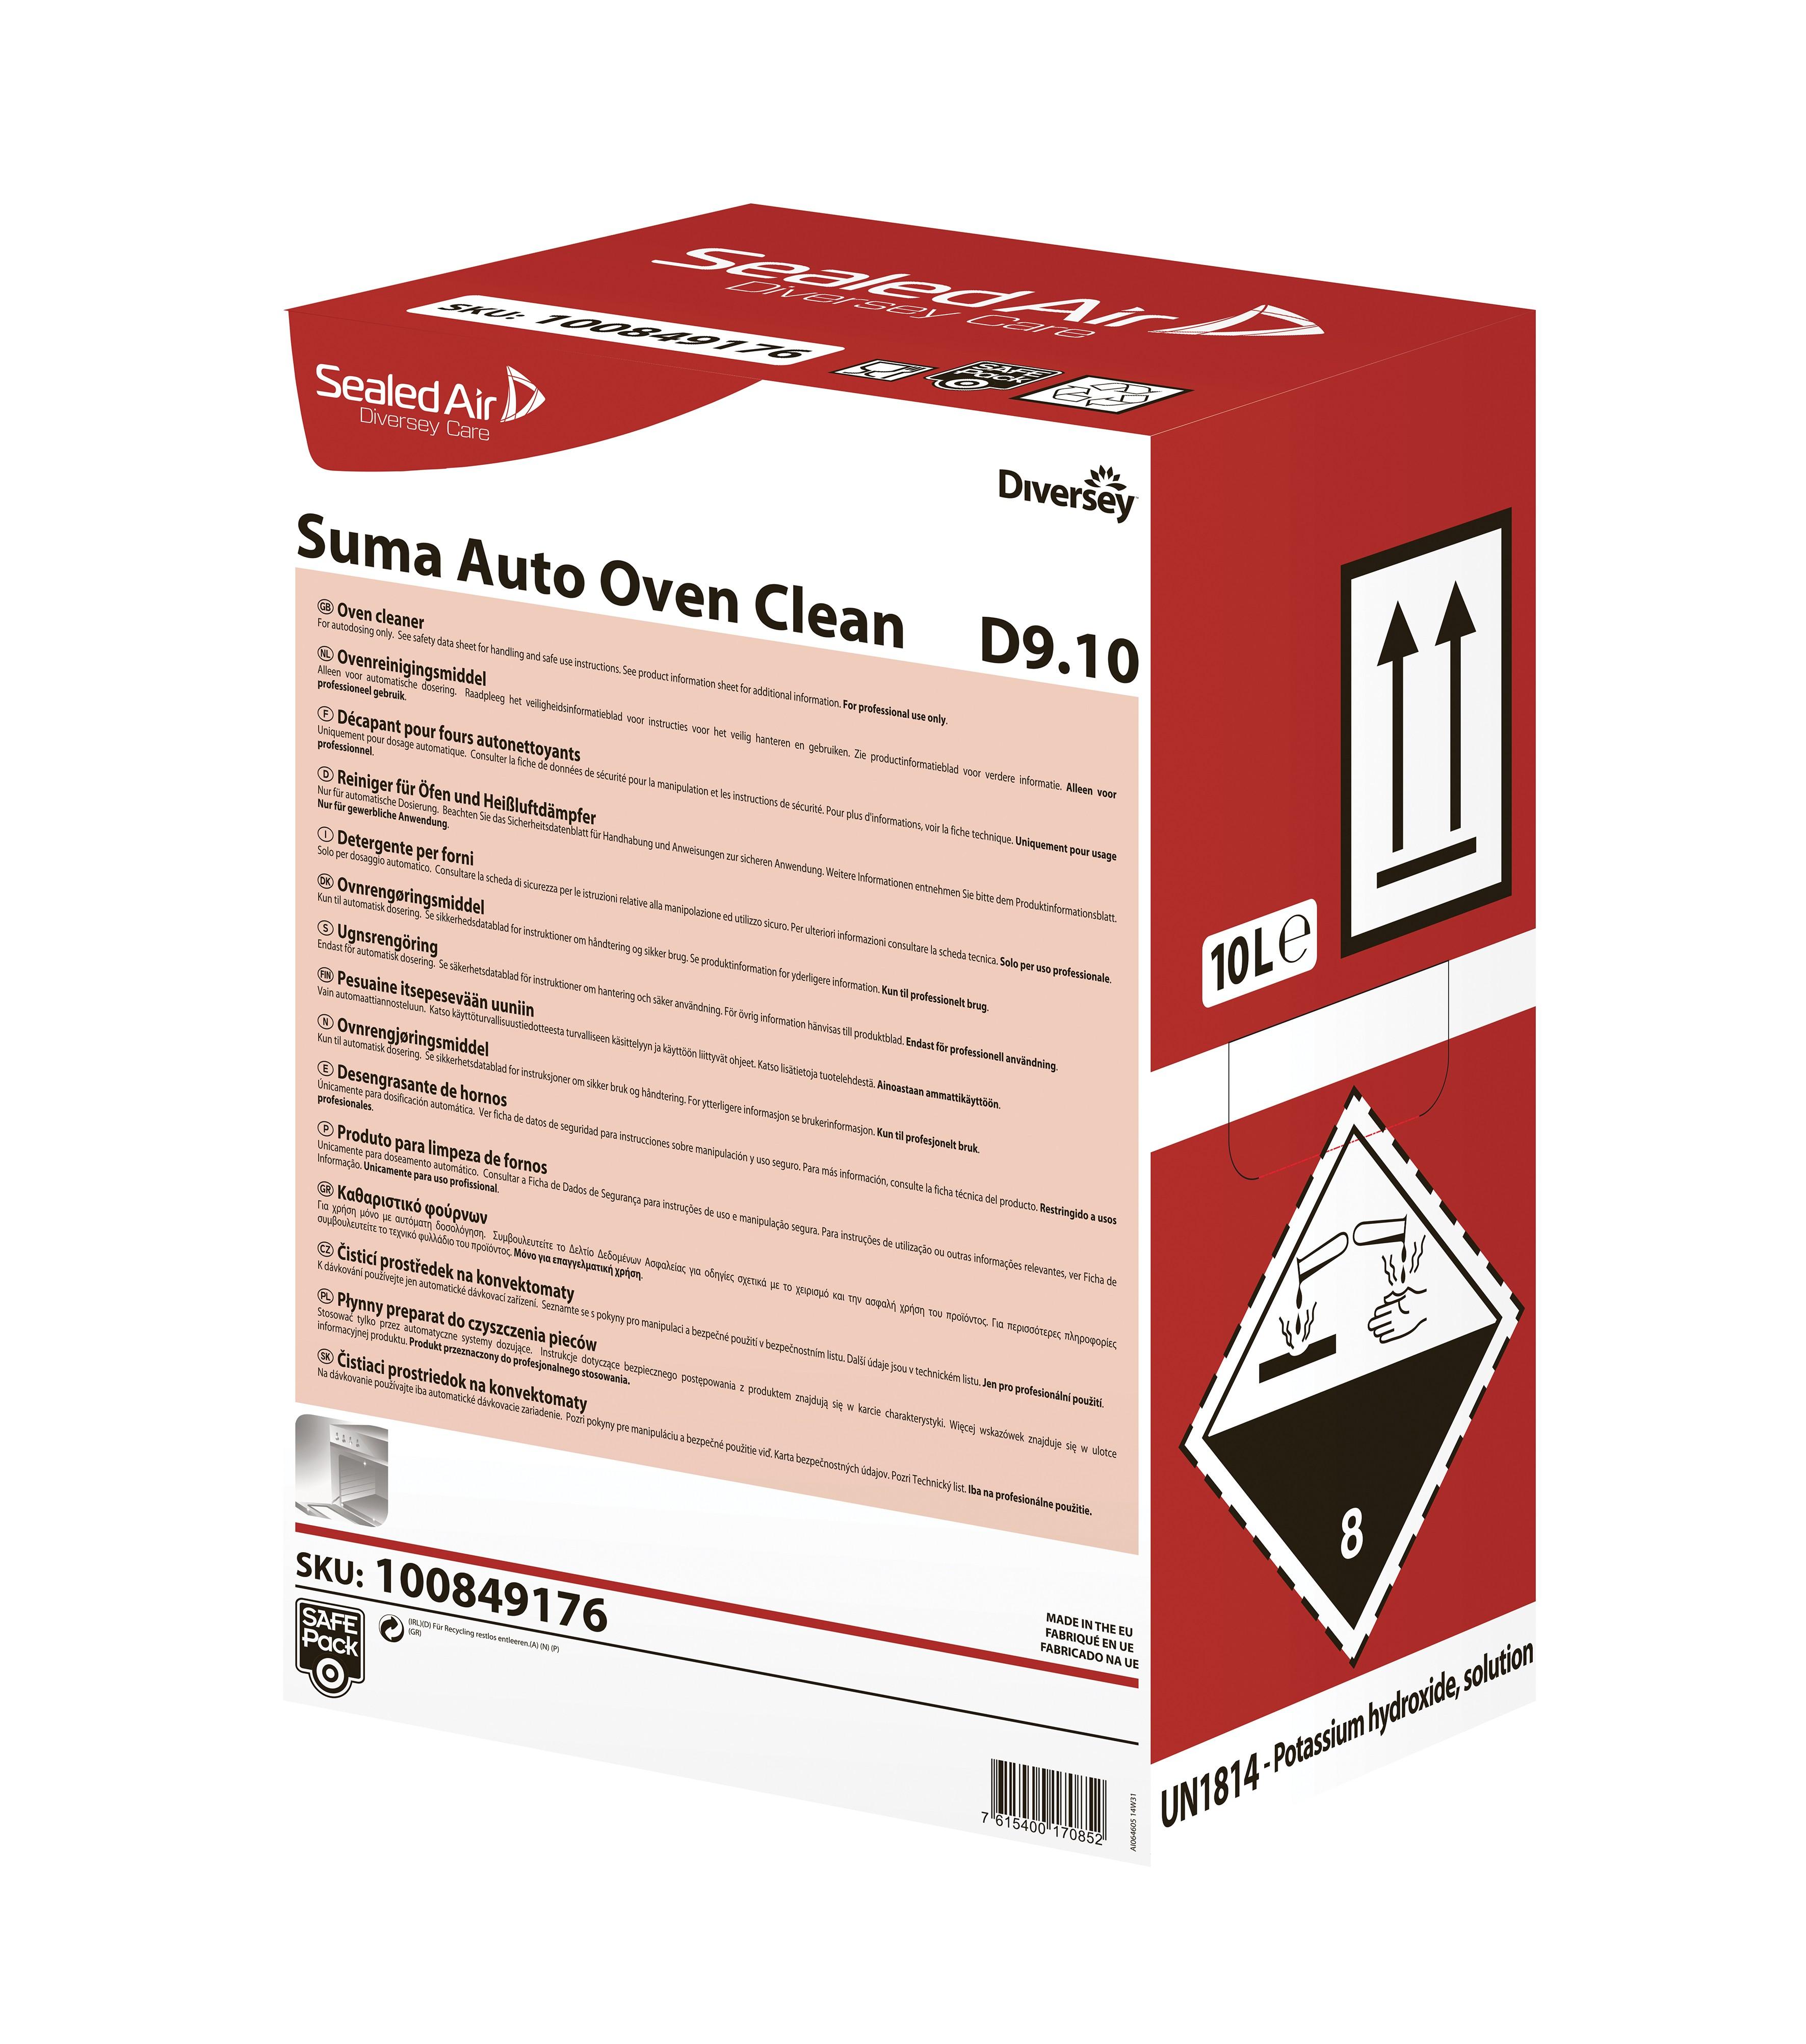 Suma Auto Oven Clean D9.10 10L